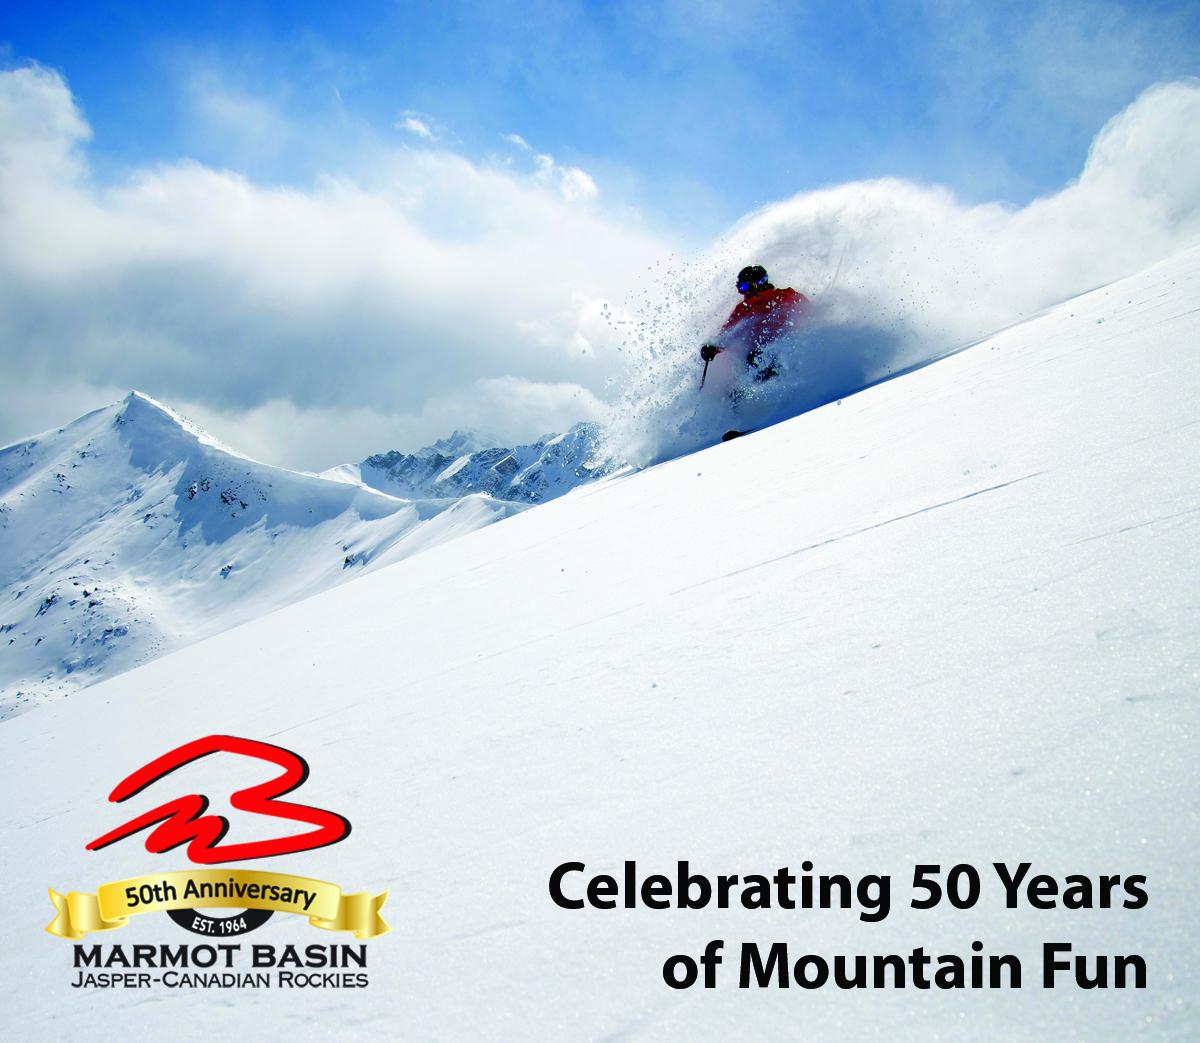 Marmot Basin Jasper